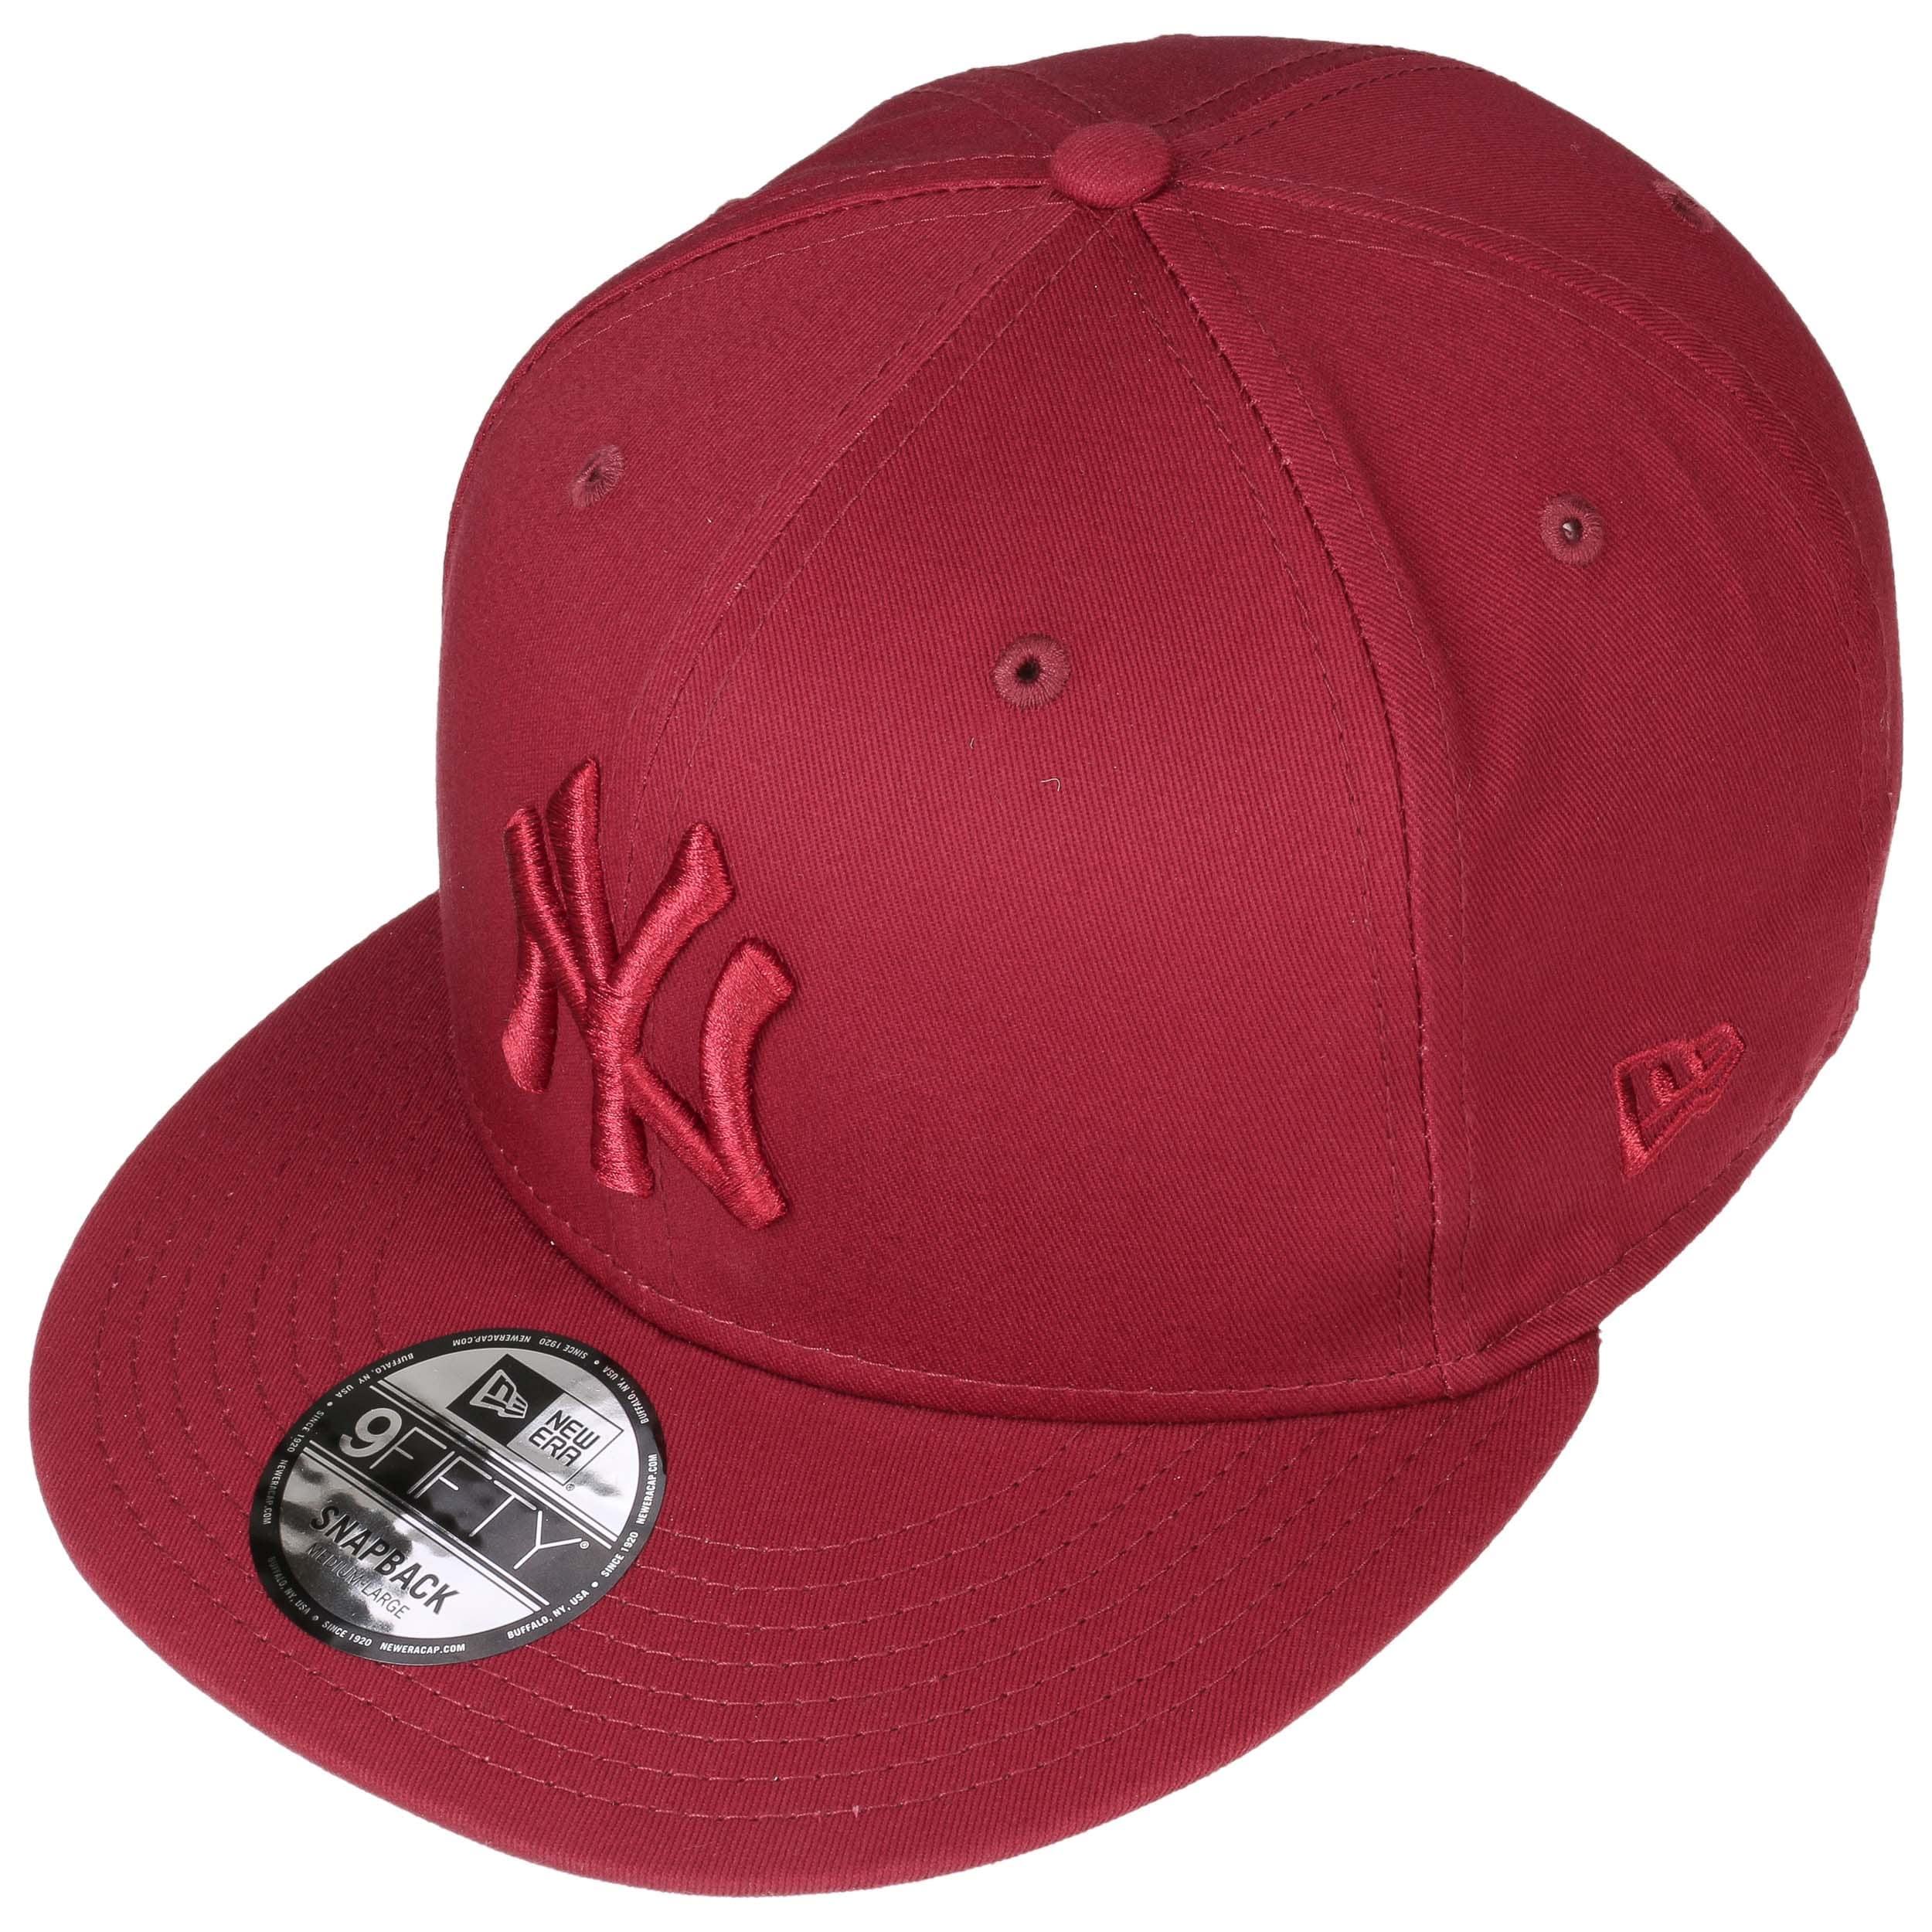 9Fifty Uni League Ess Yankees Cap by New Era - bordeaux 1 ... aca1b18b8f91